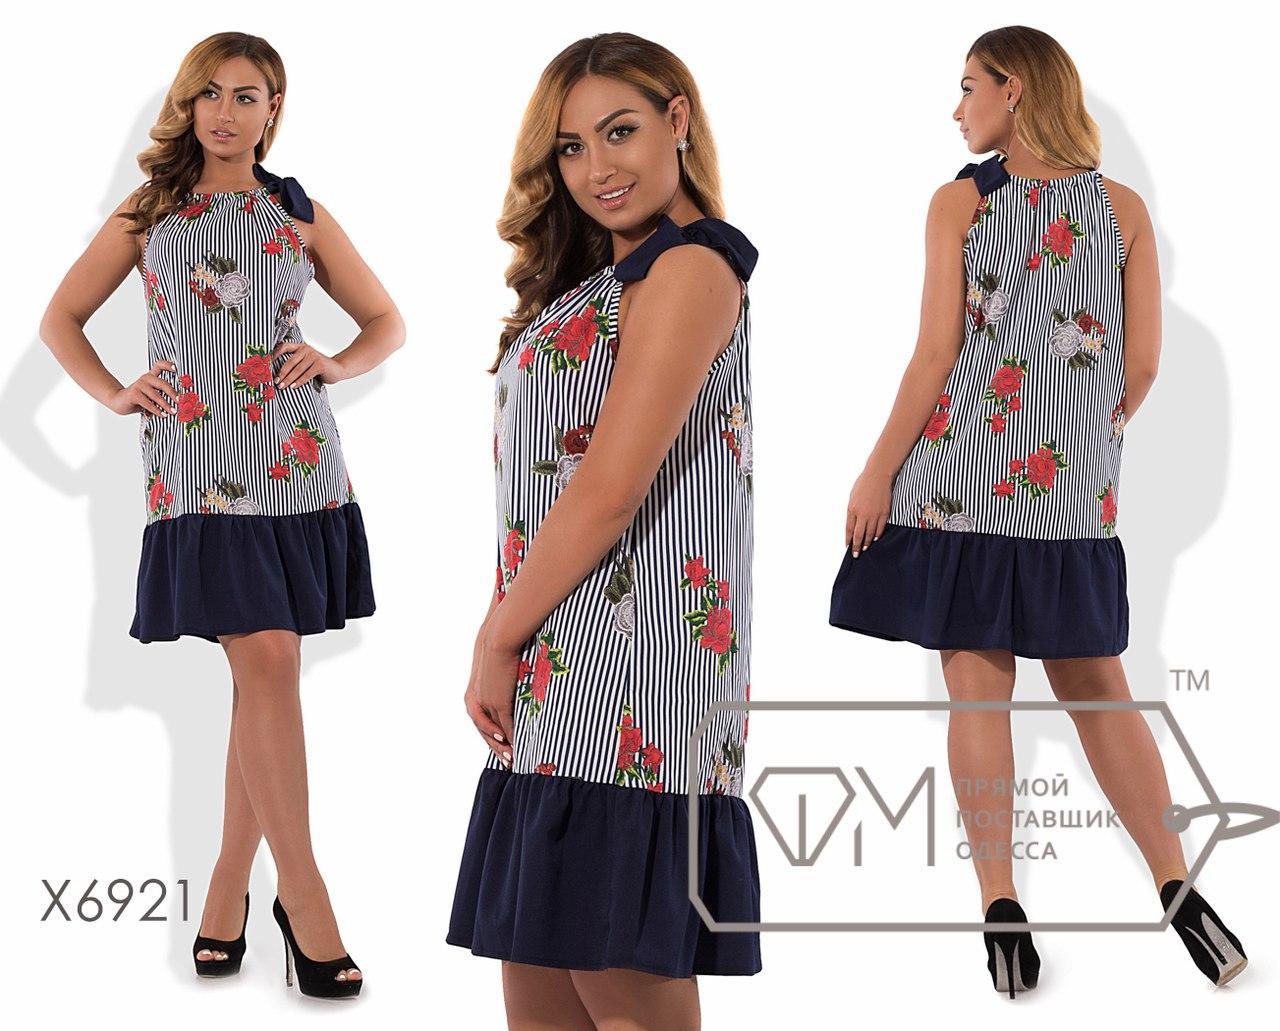 "Летнее платье на бретелях БАТ 710 (6922)  - Интернет-бутик ""БЛУЗОН"" в Одессе"